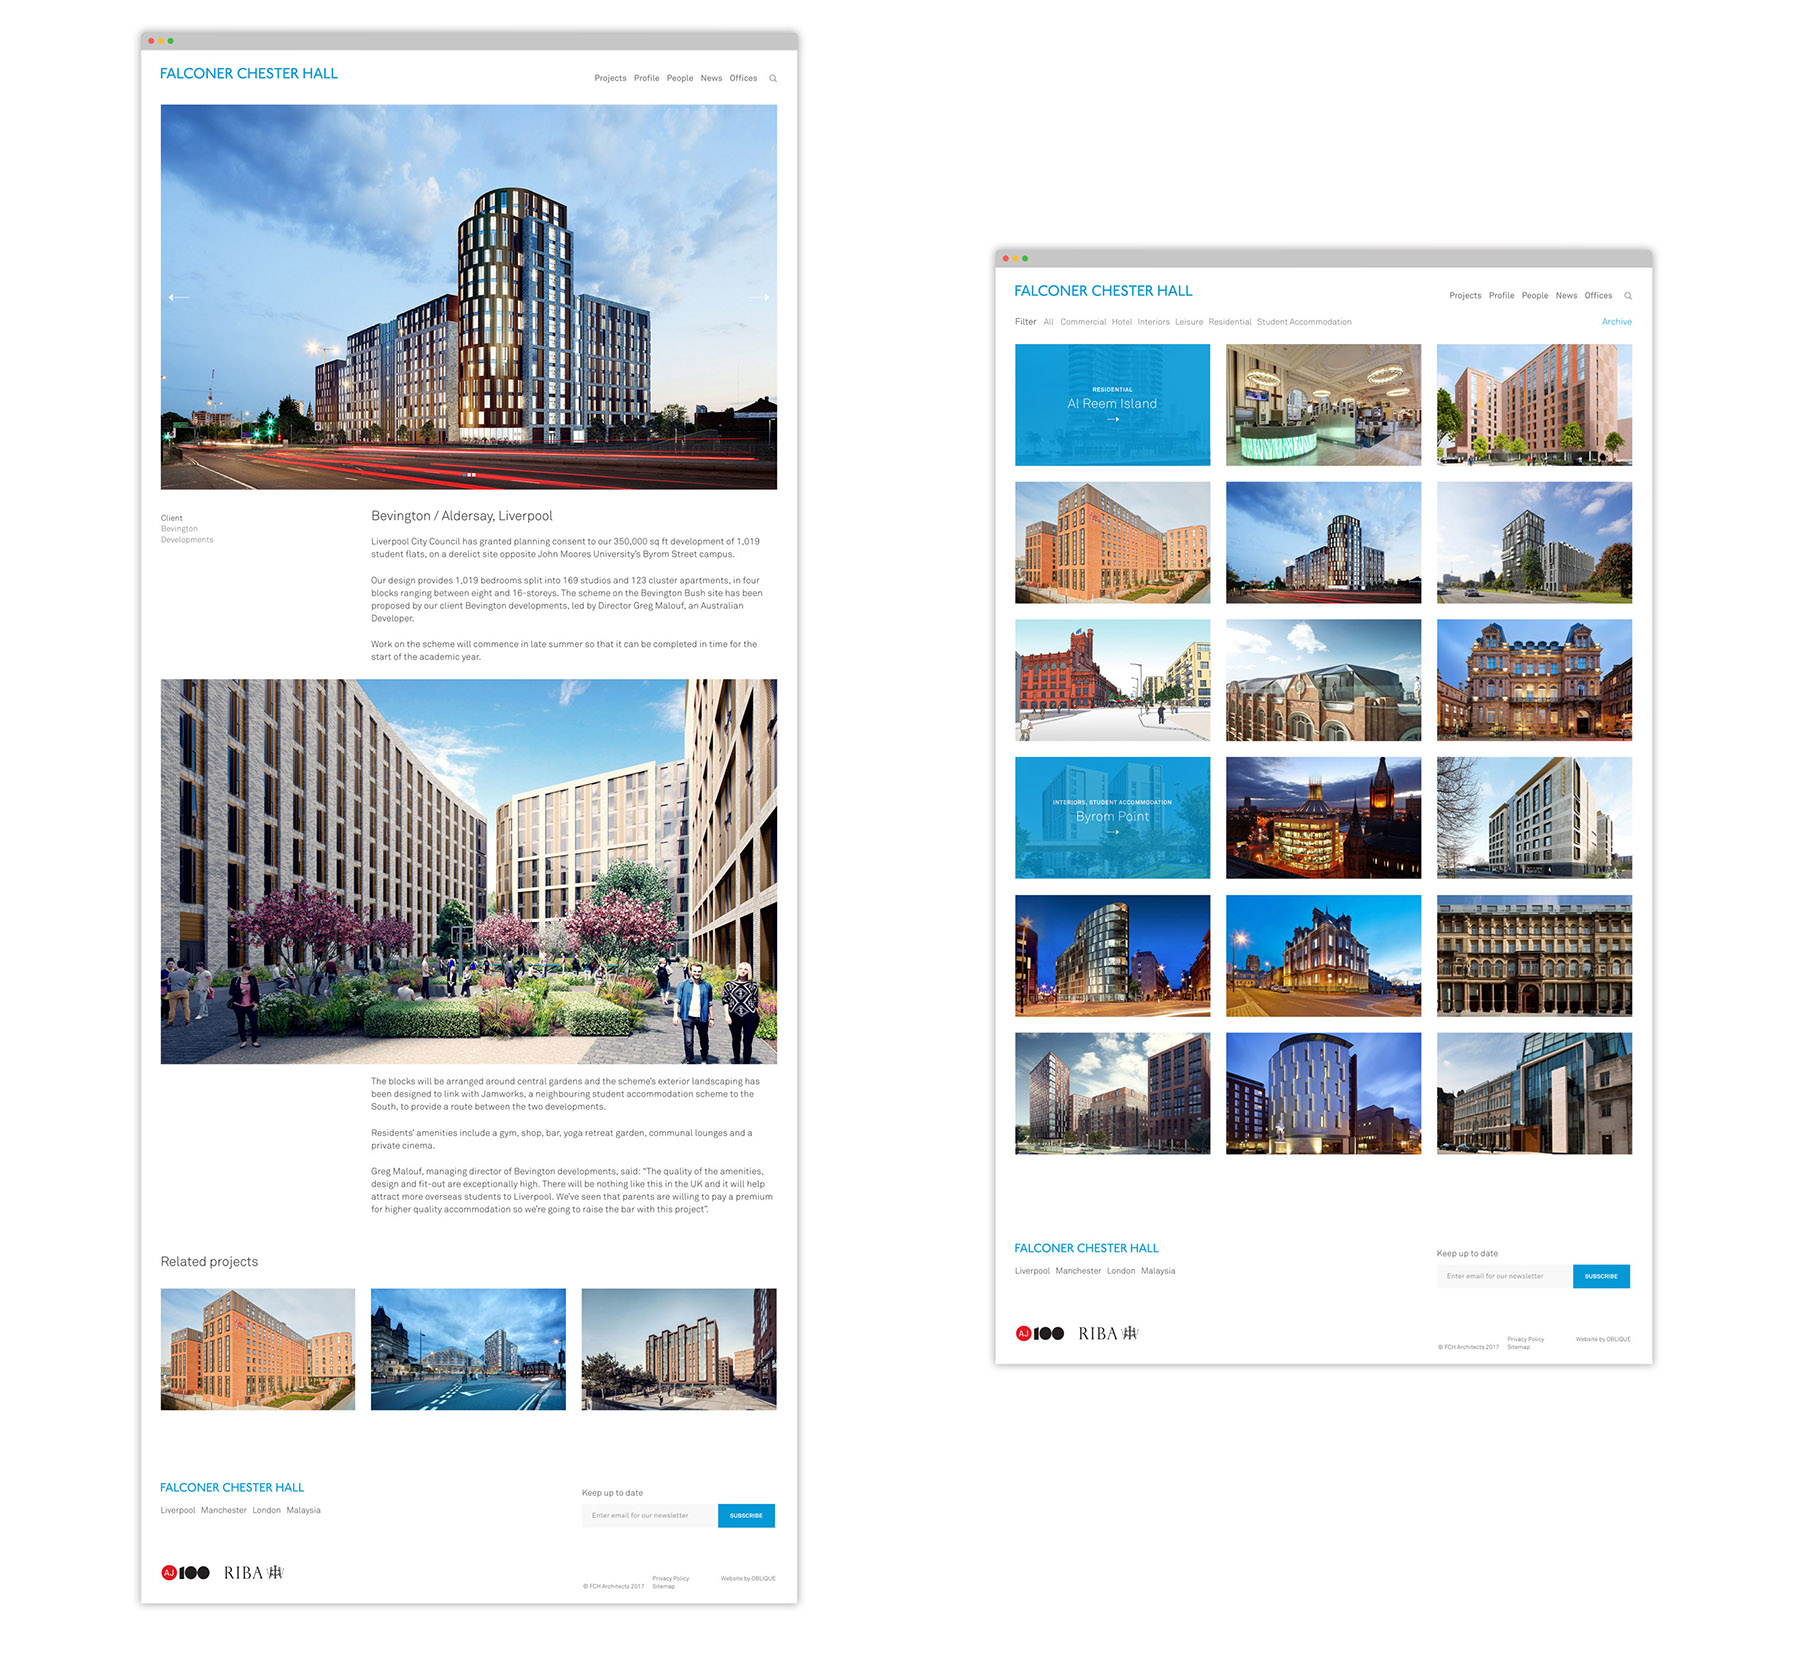 falconer chester hall website design by Leeds based Freelance Designer Neil Holroyd